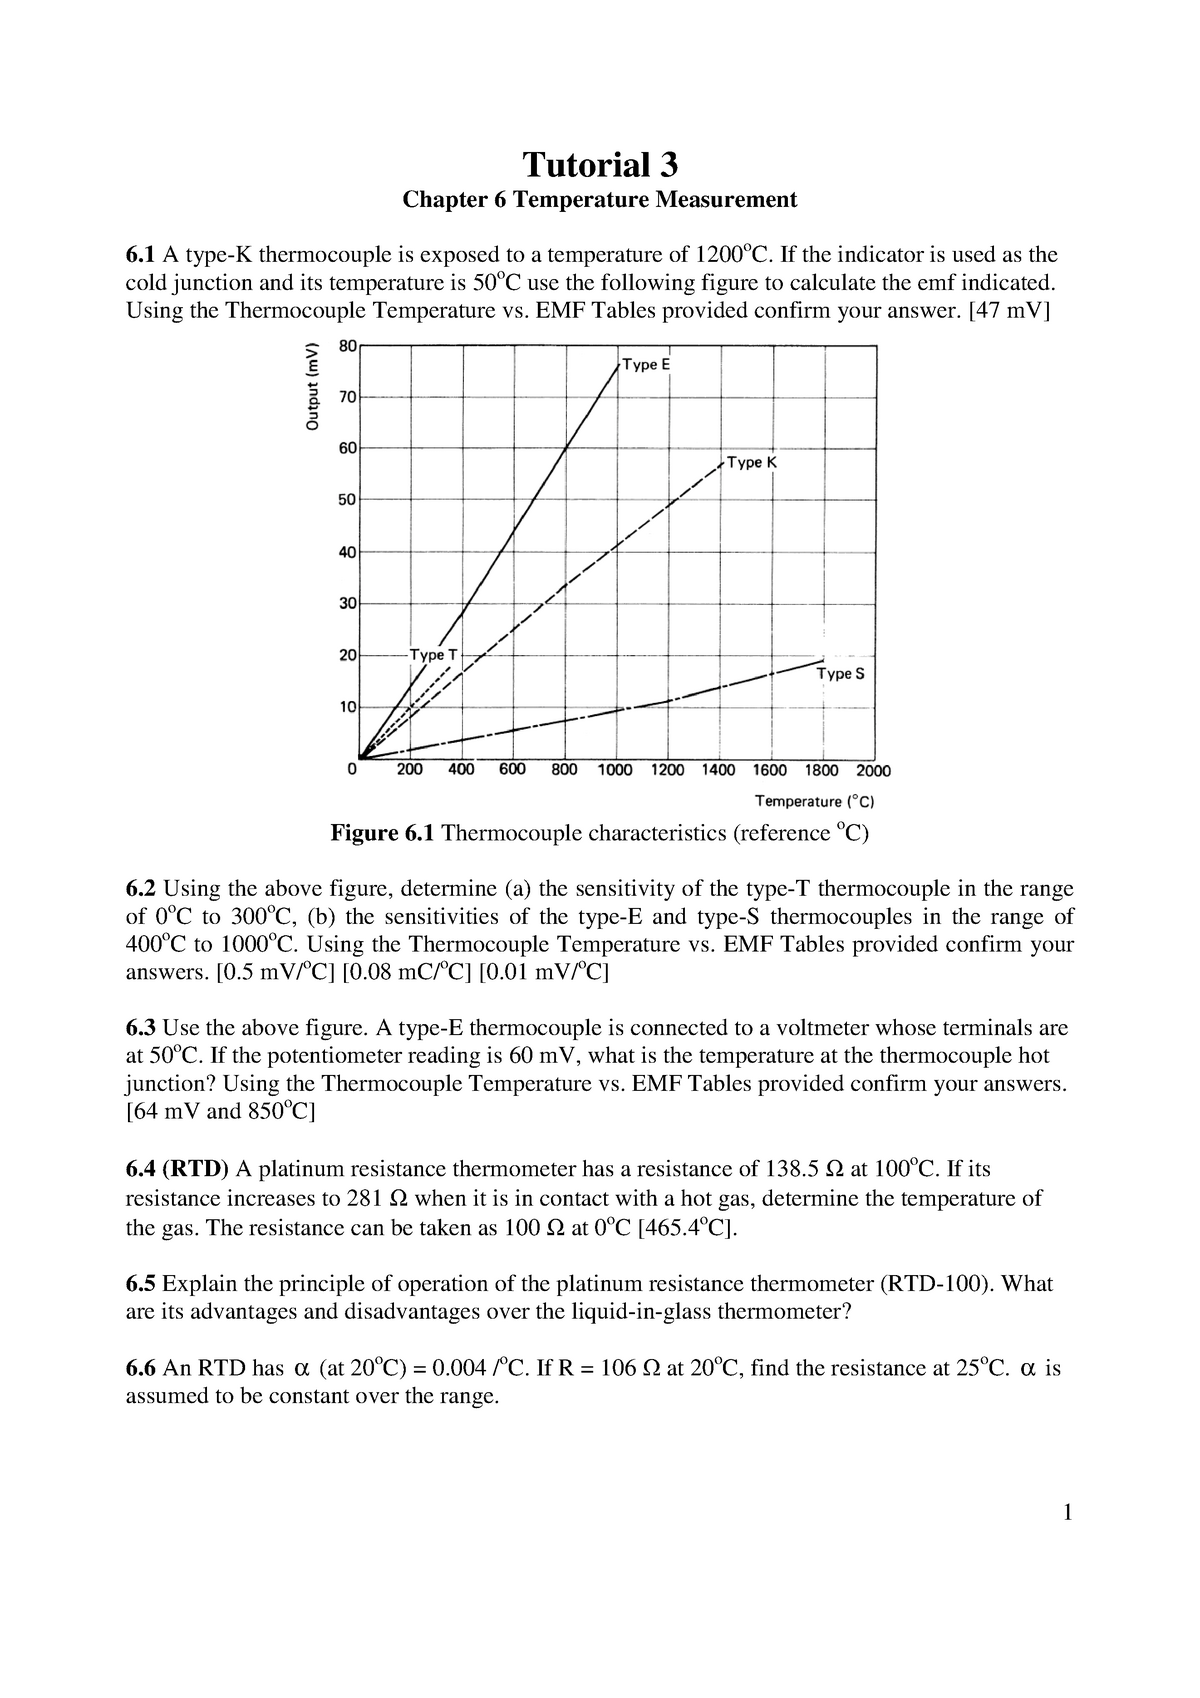 Tutorial 03 - lecture notes - DRA7004: Performance Lab - StuDocu